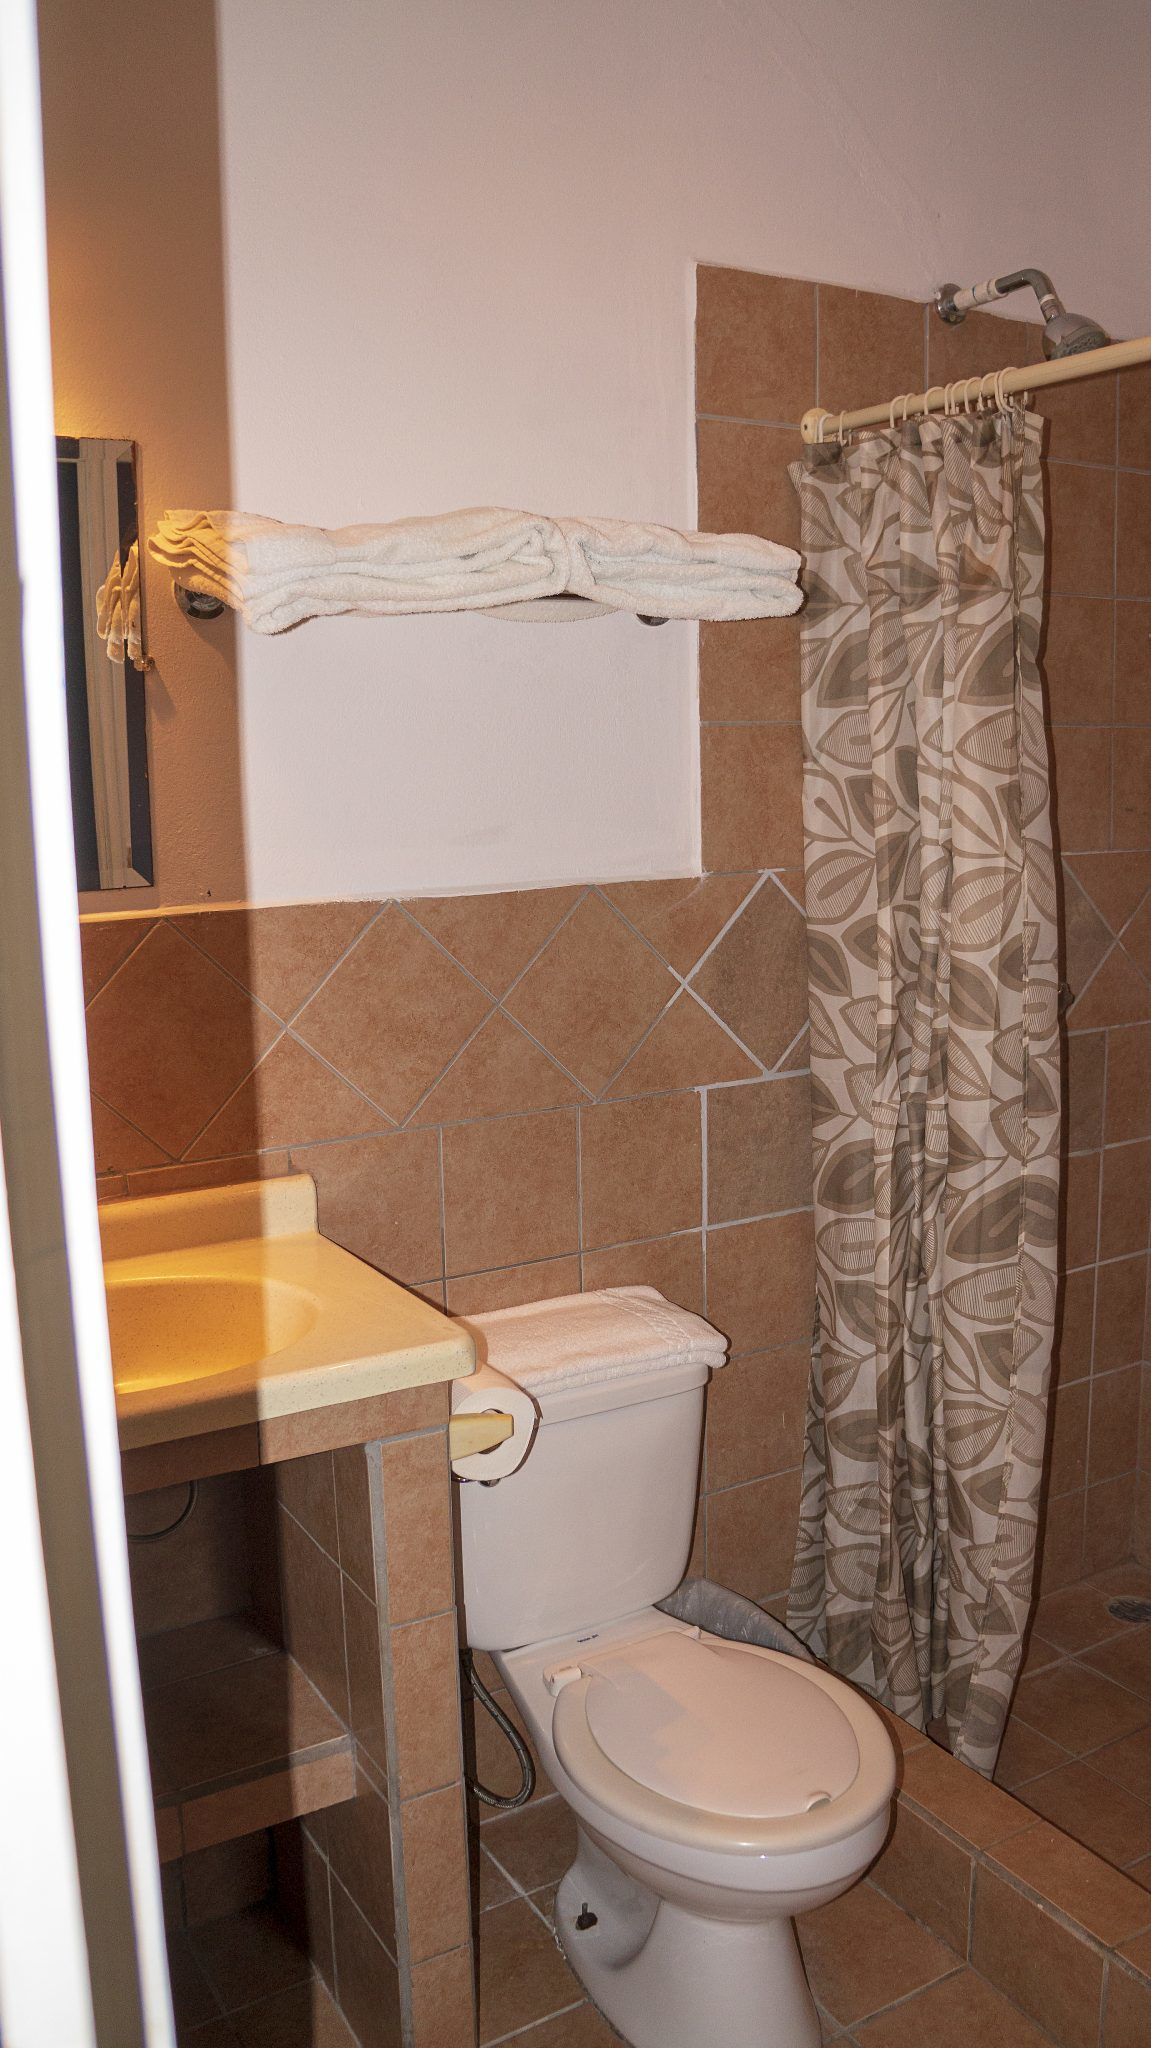 LC17 - Bathroom